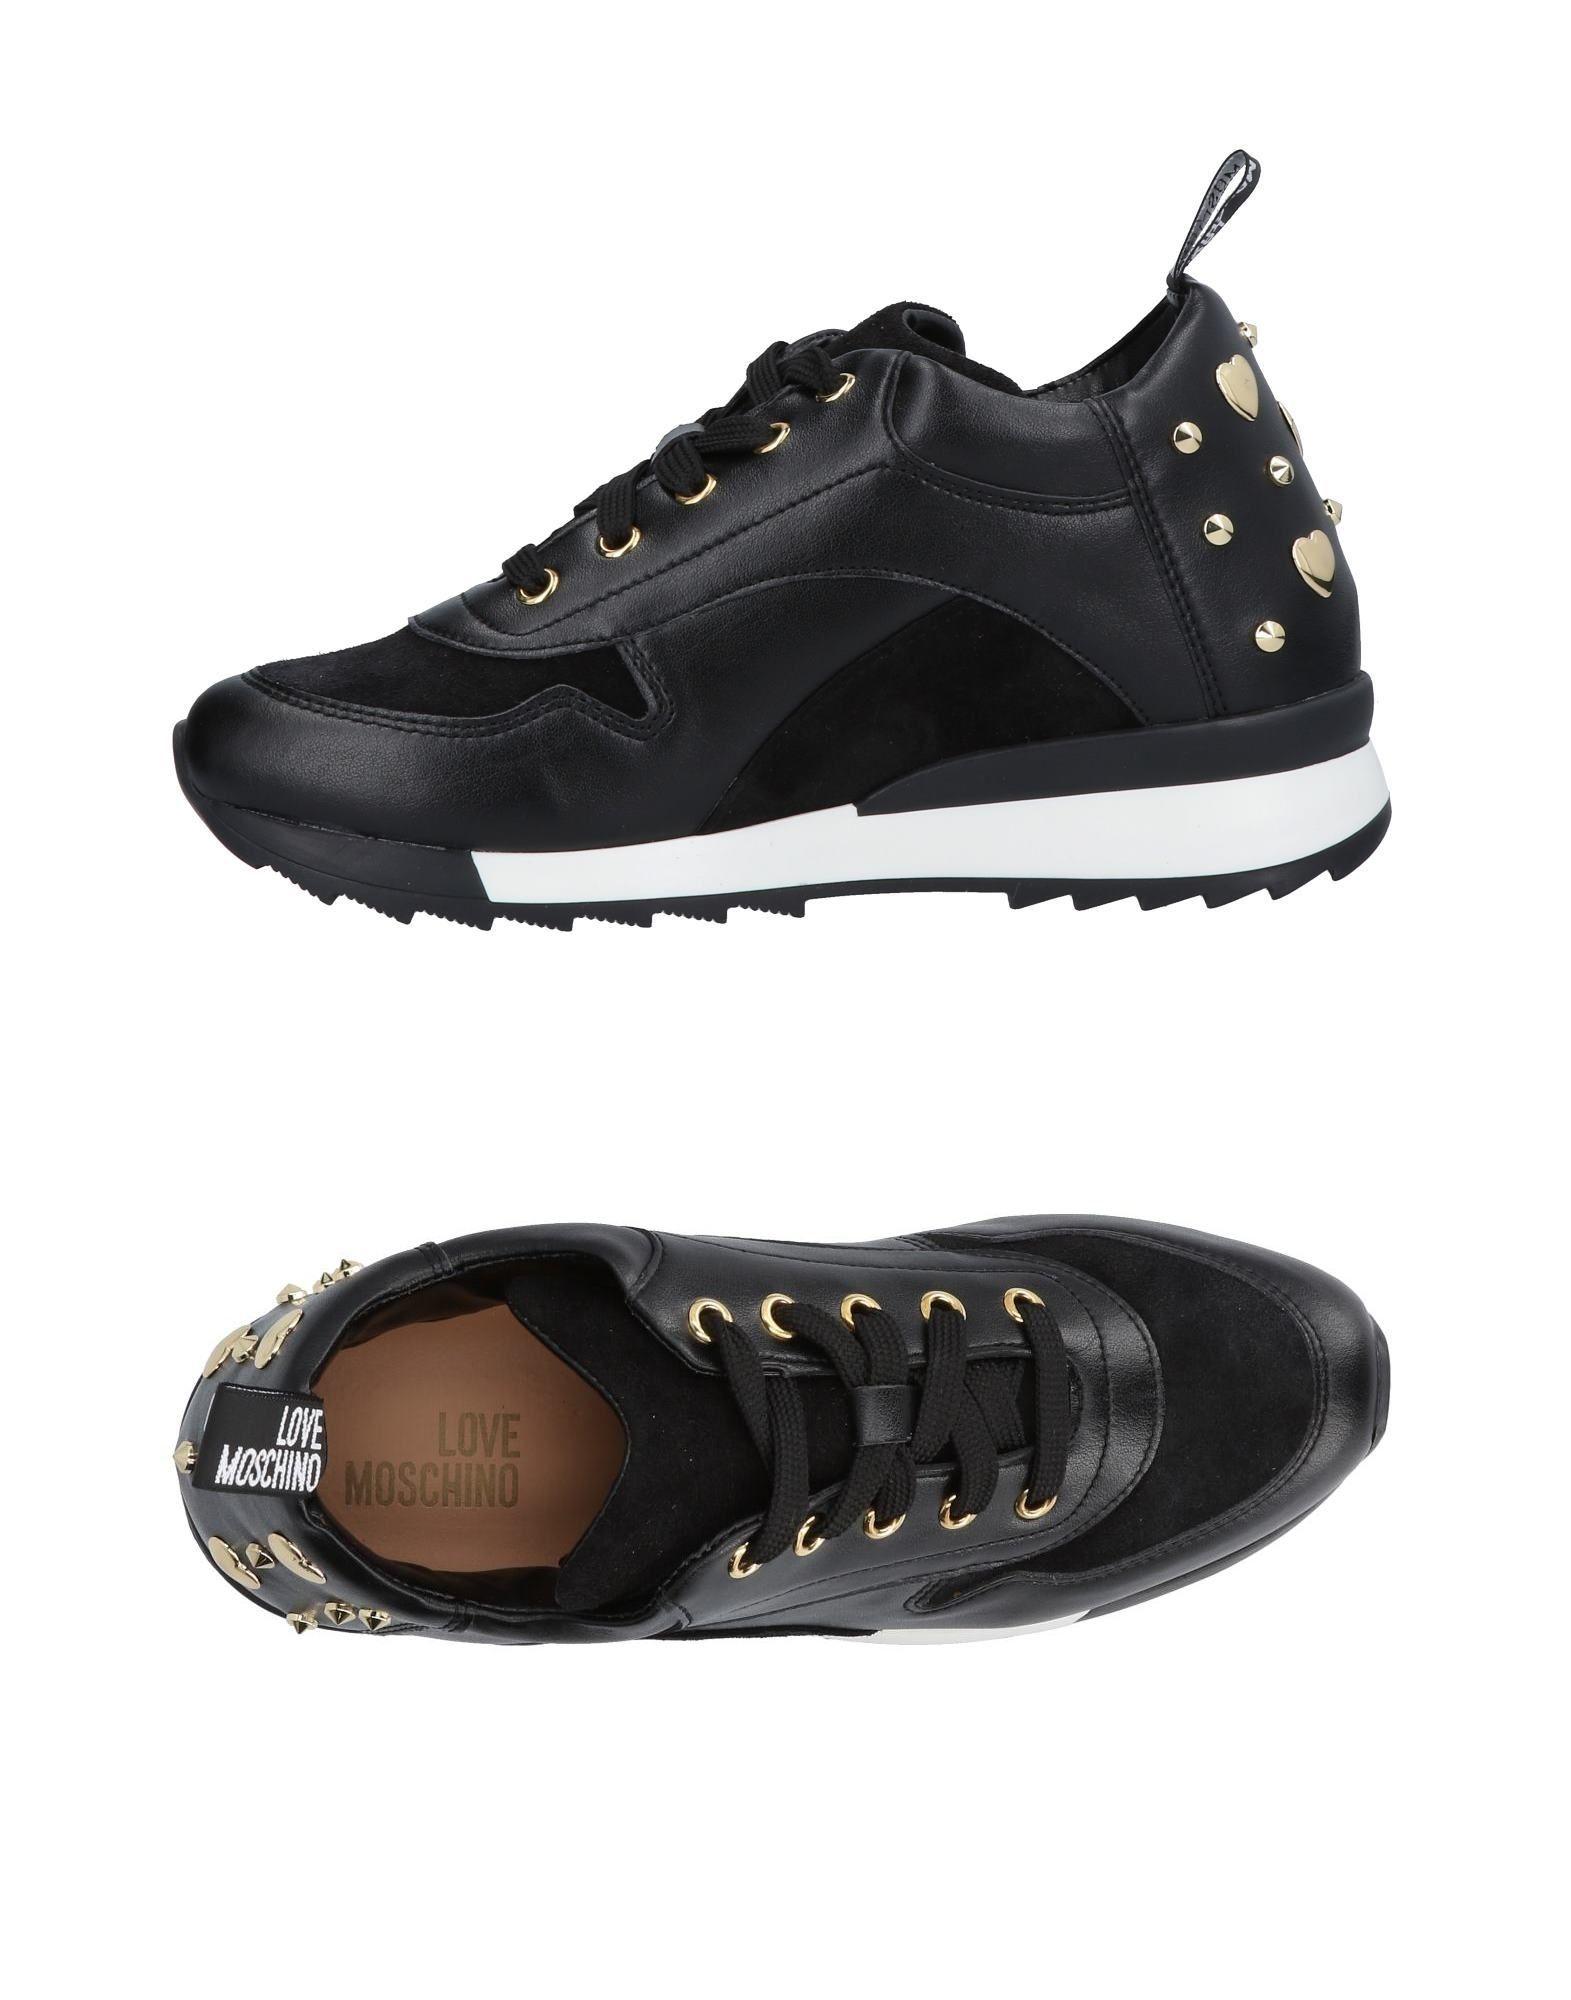 Stilvolle billige Schuhe Love Moschino Sneakers Damen  11450980PG